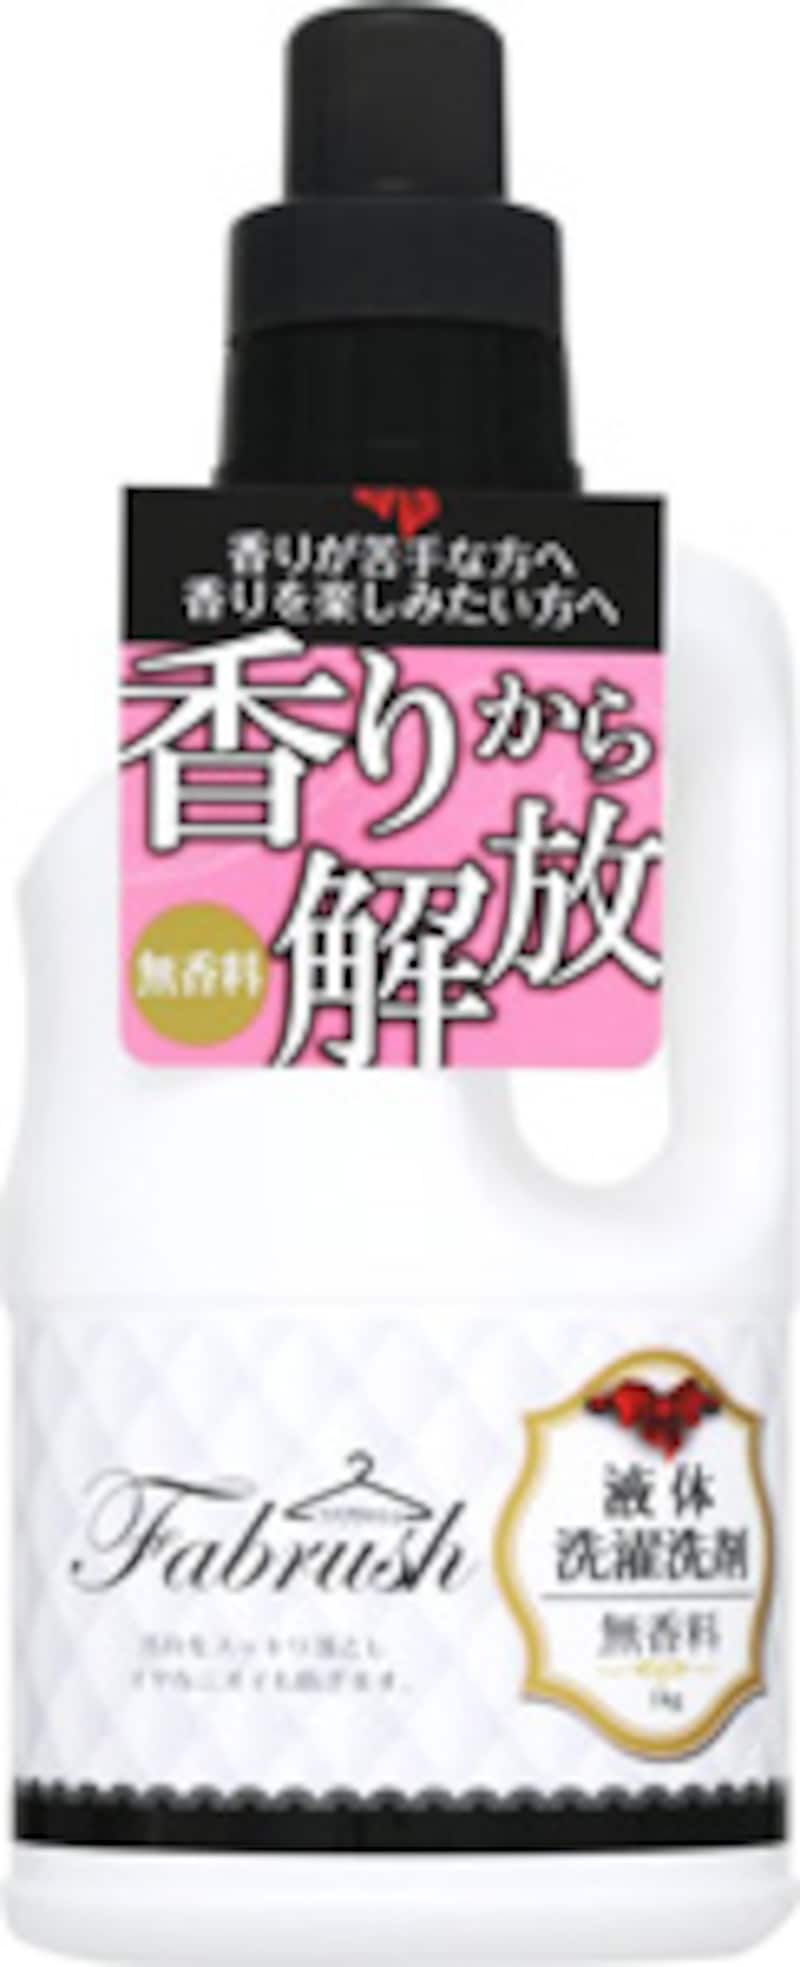 addgood(アドグッド),fabrush 衣料用液体洗剤 無香料